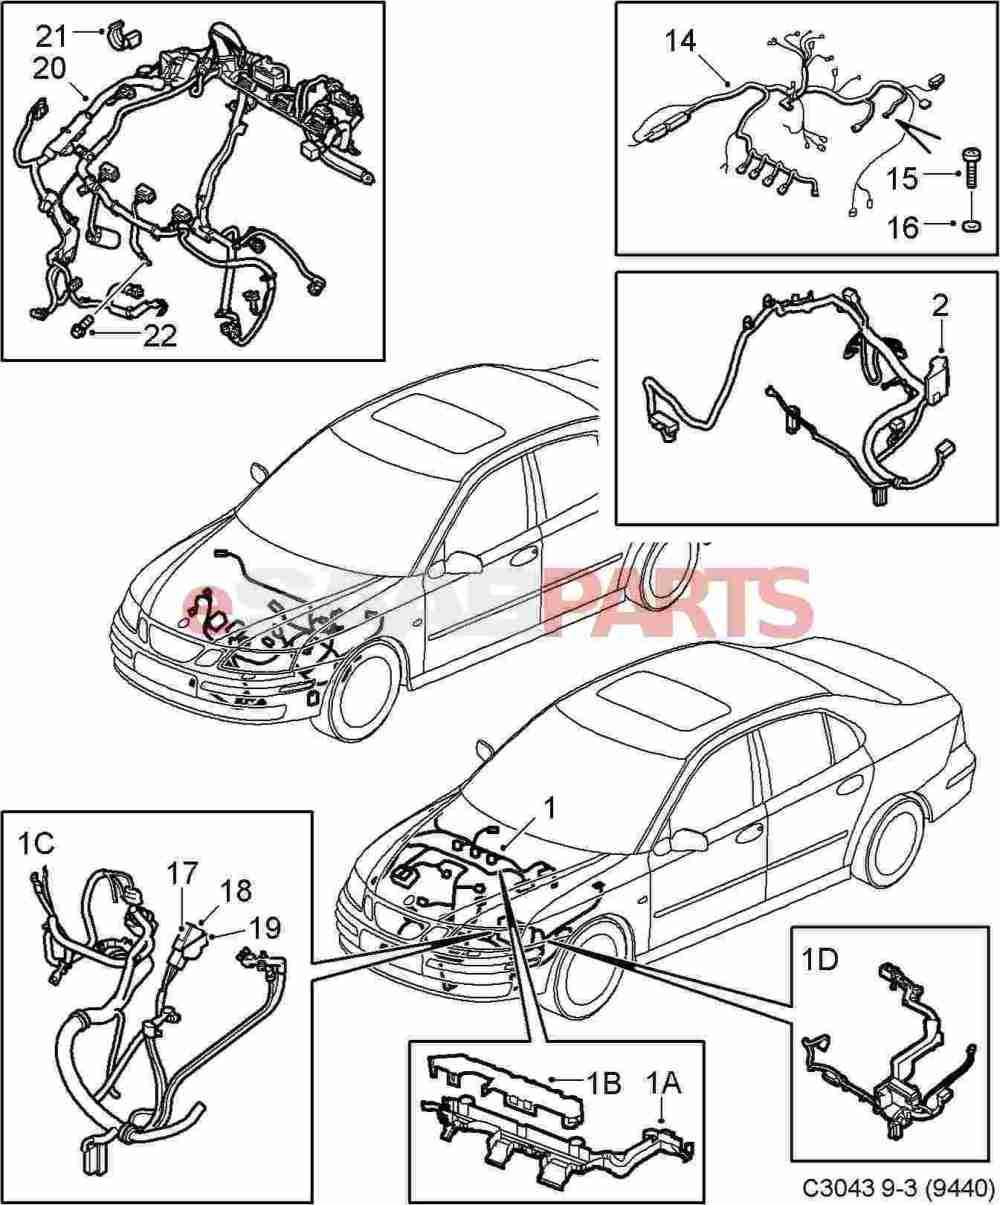 medium resolution of saab 9 3 2006 wiring harness wiring diagrams konsult esaabparts com saab 9 3 9440